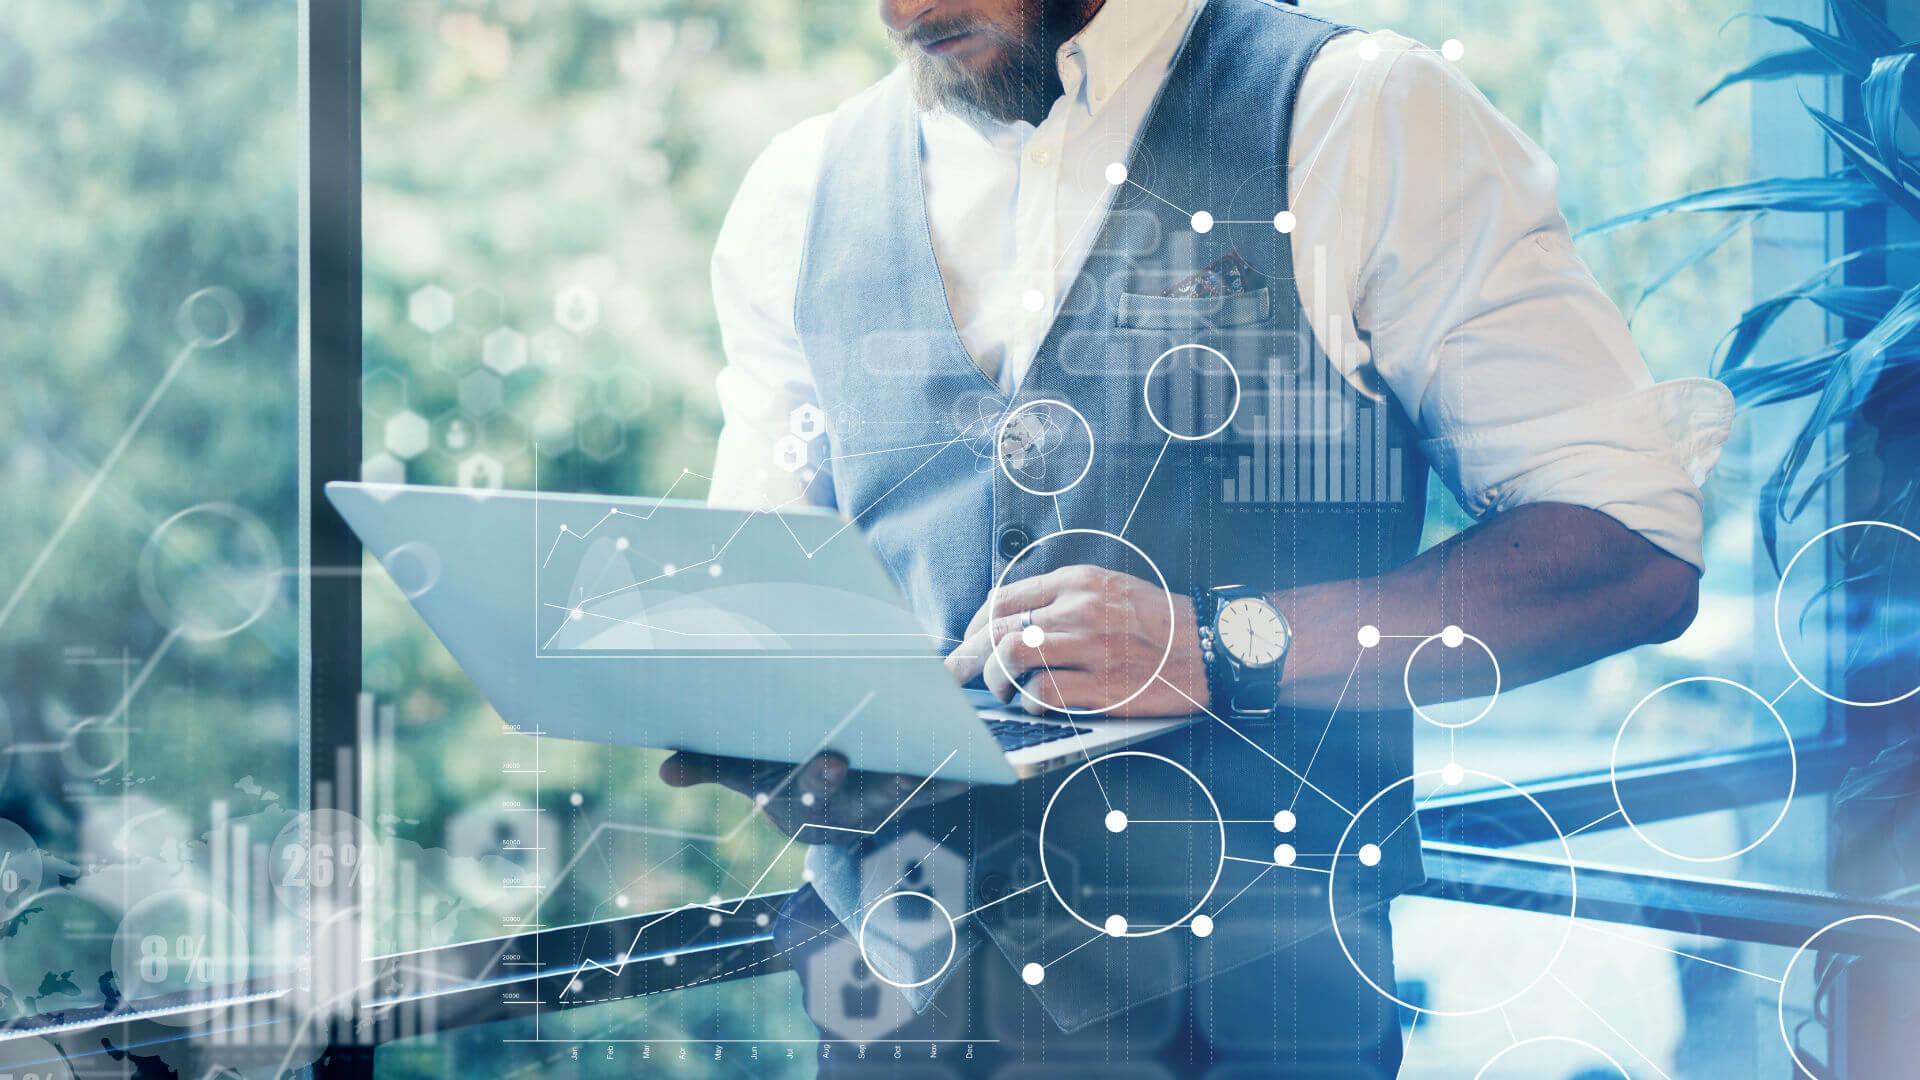 technology-man-laptop-analytics-data-ss-1920